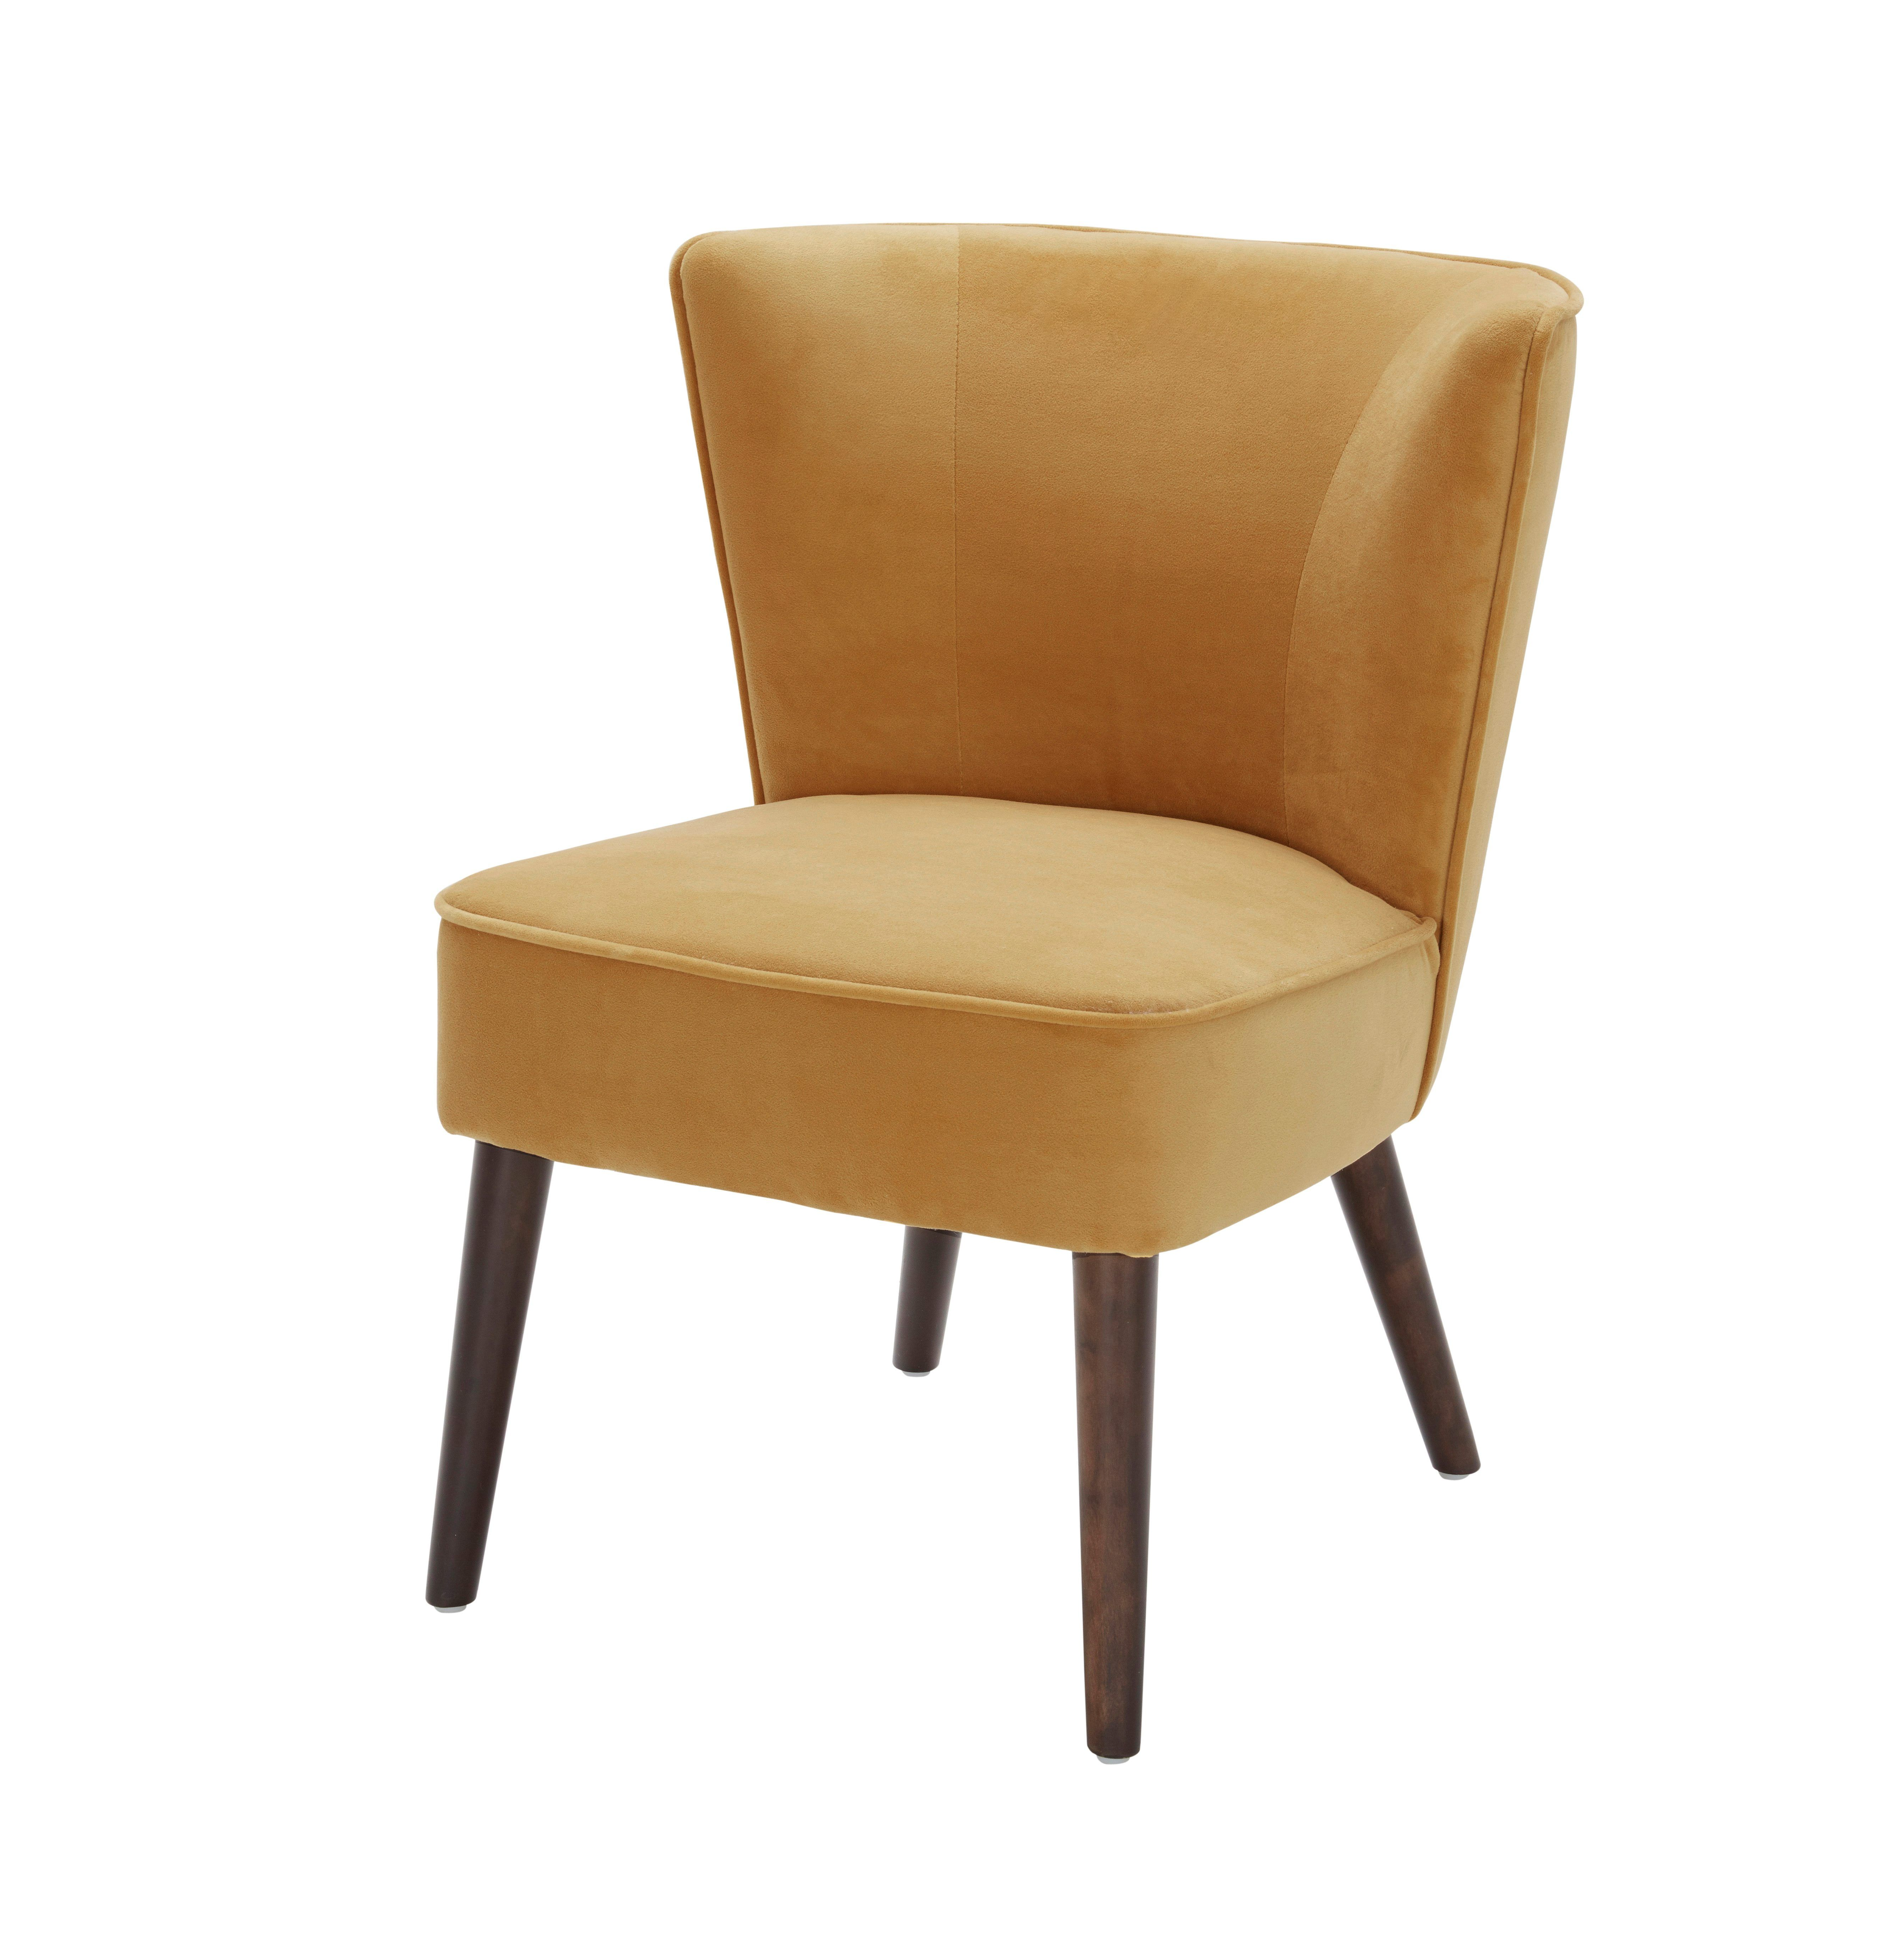 fauteuil harry tissu velours jaune mix match pinterest tissu velours velours et fauteuils. Black Bedroom Furniture Sets. Home Design Ideas